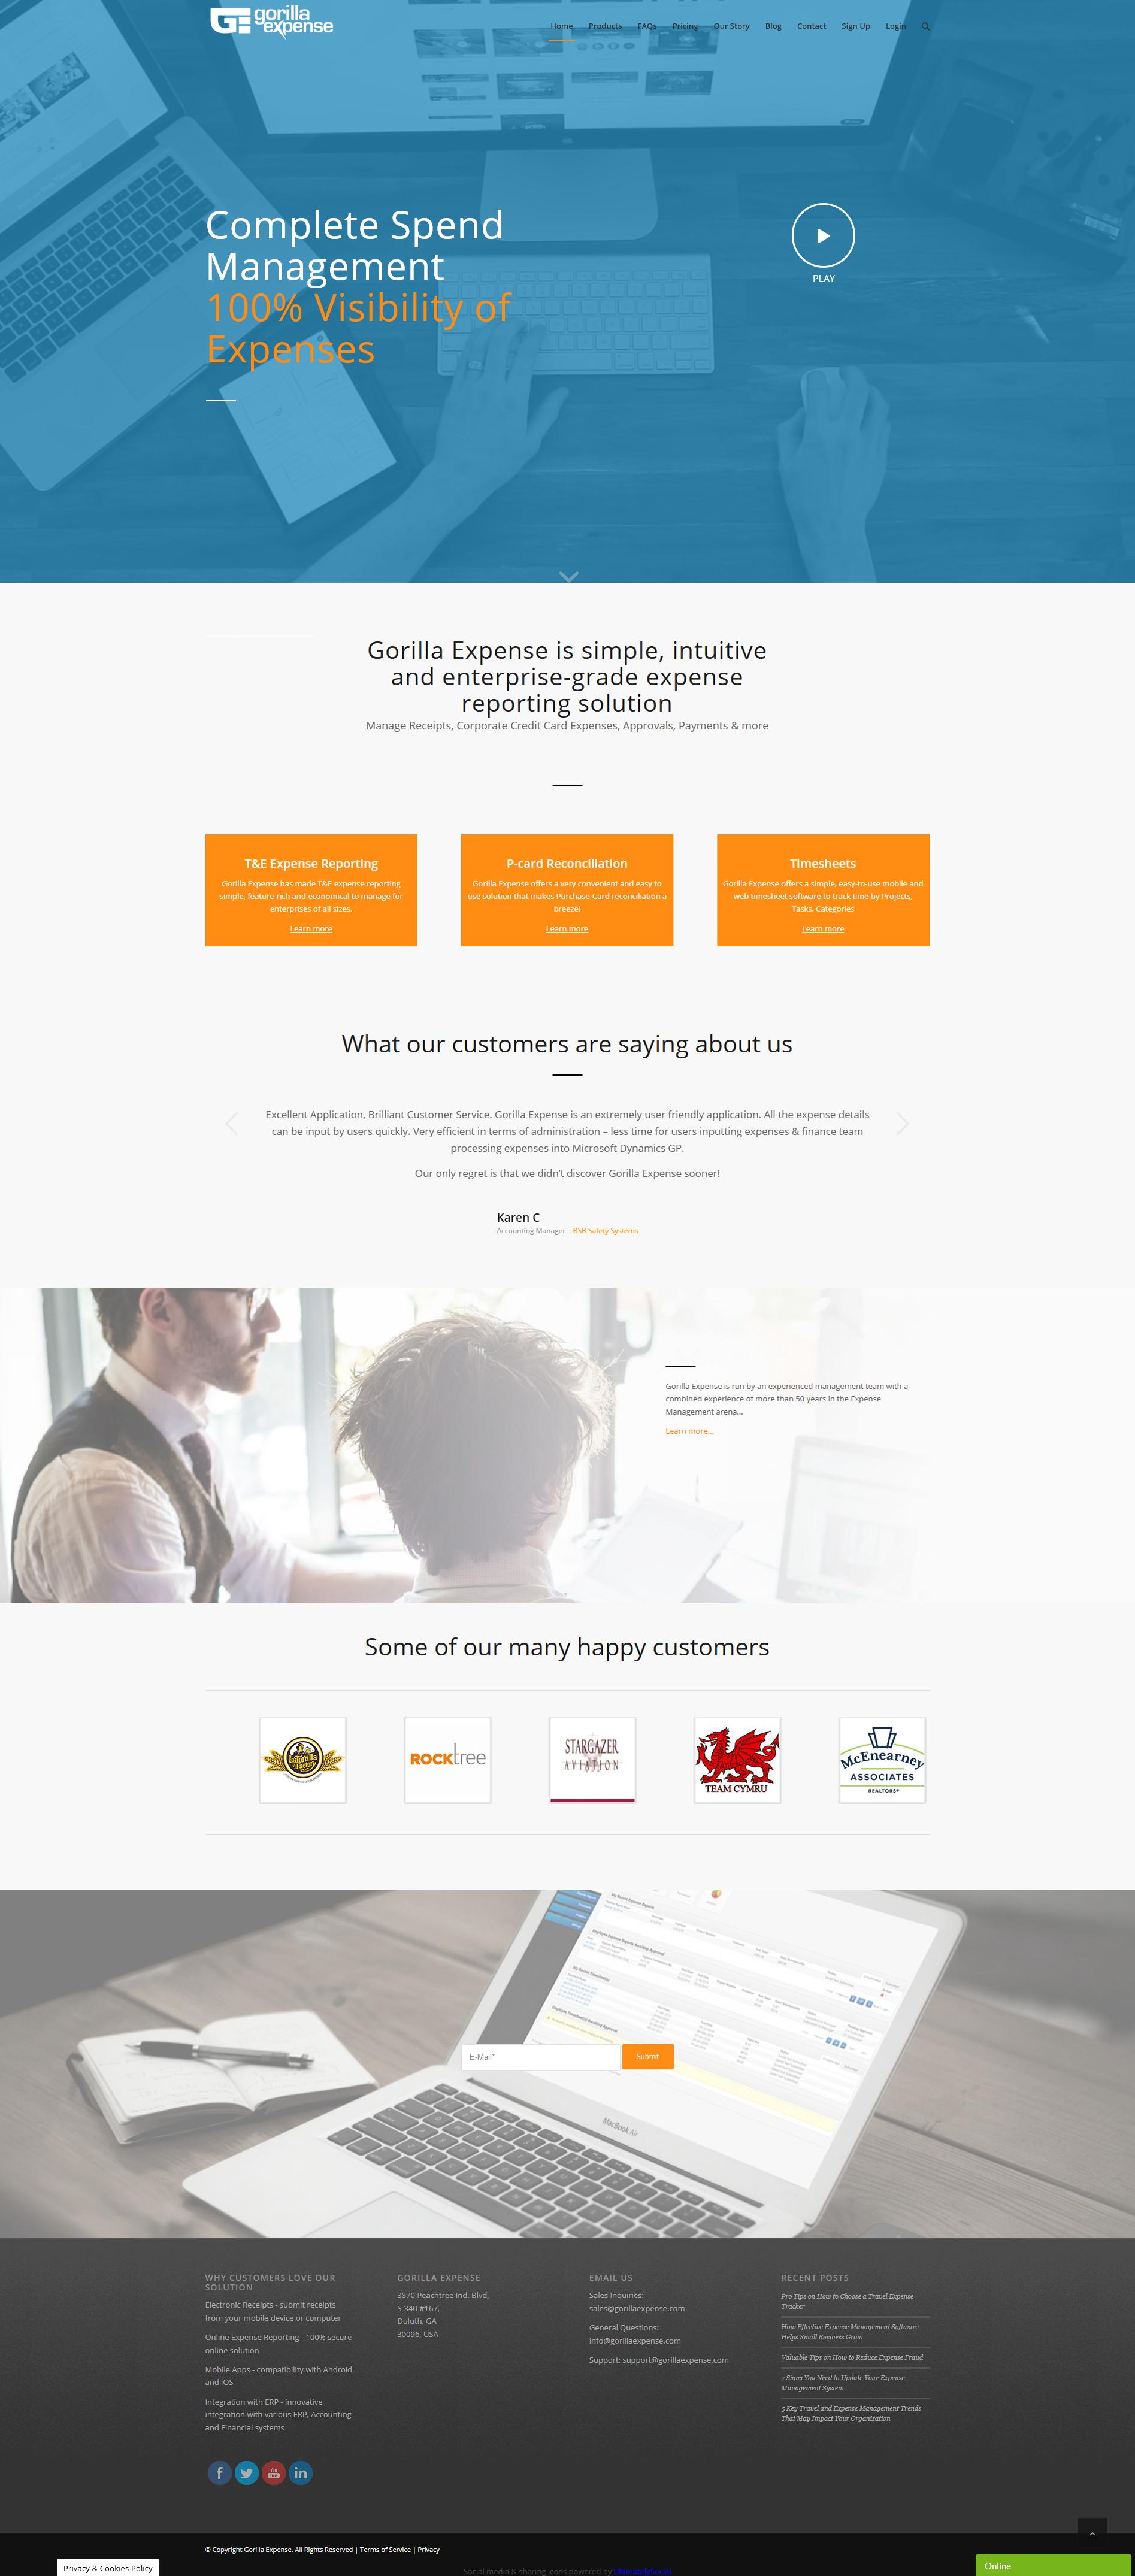 Service for Convenient Cost Control Web development